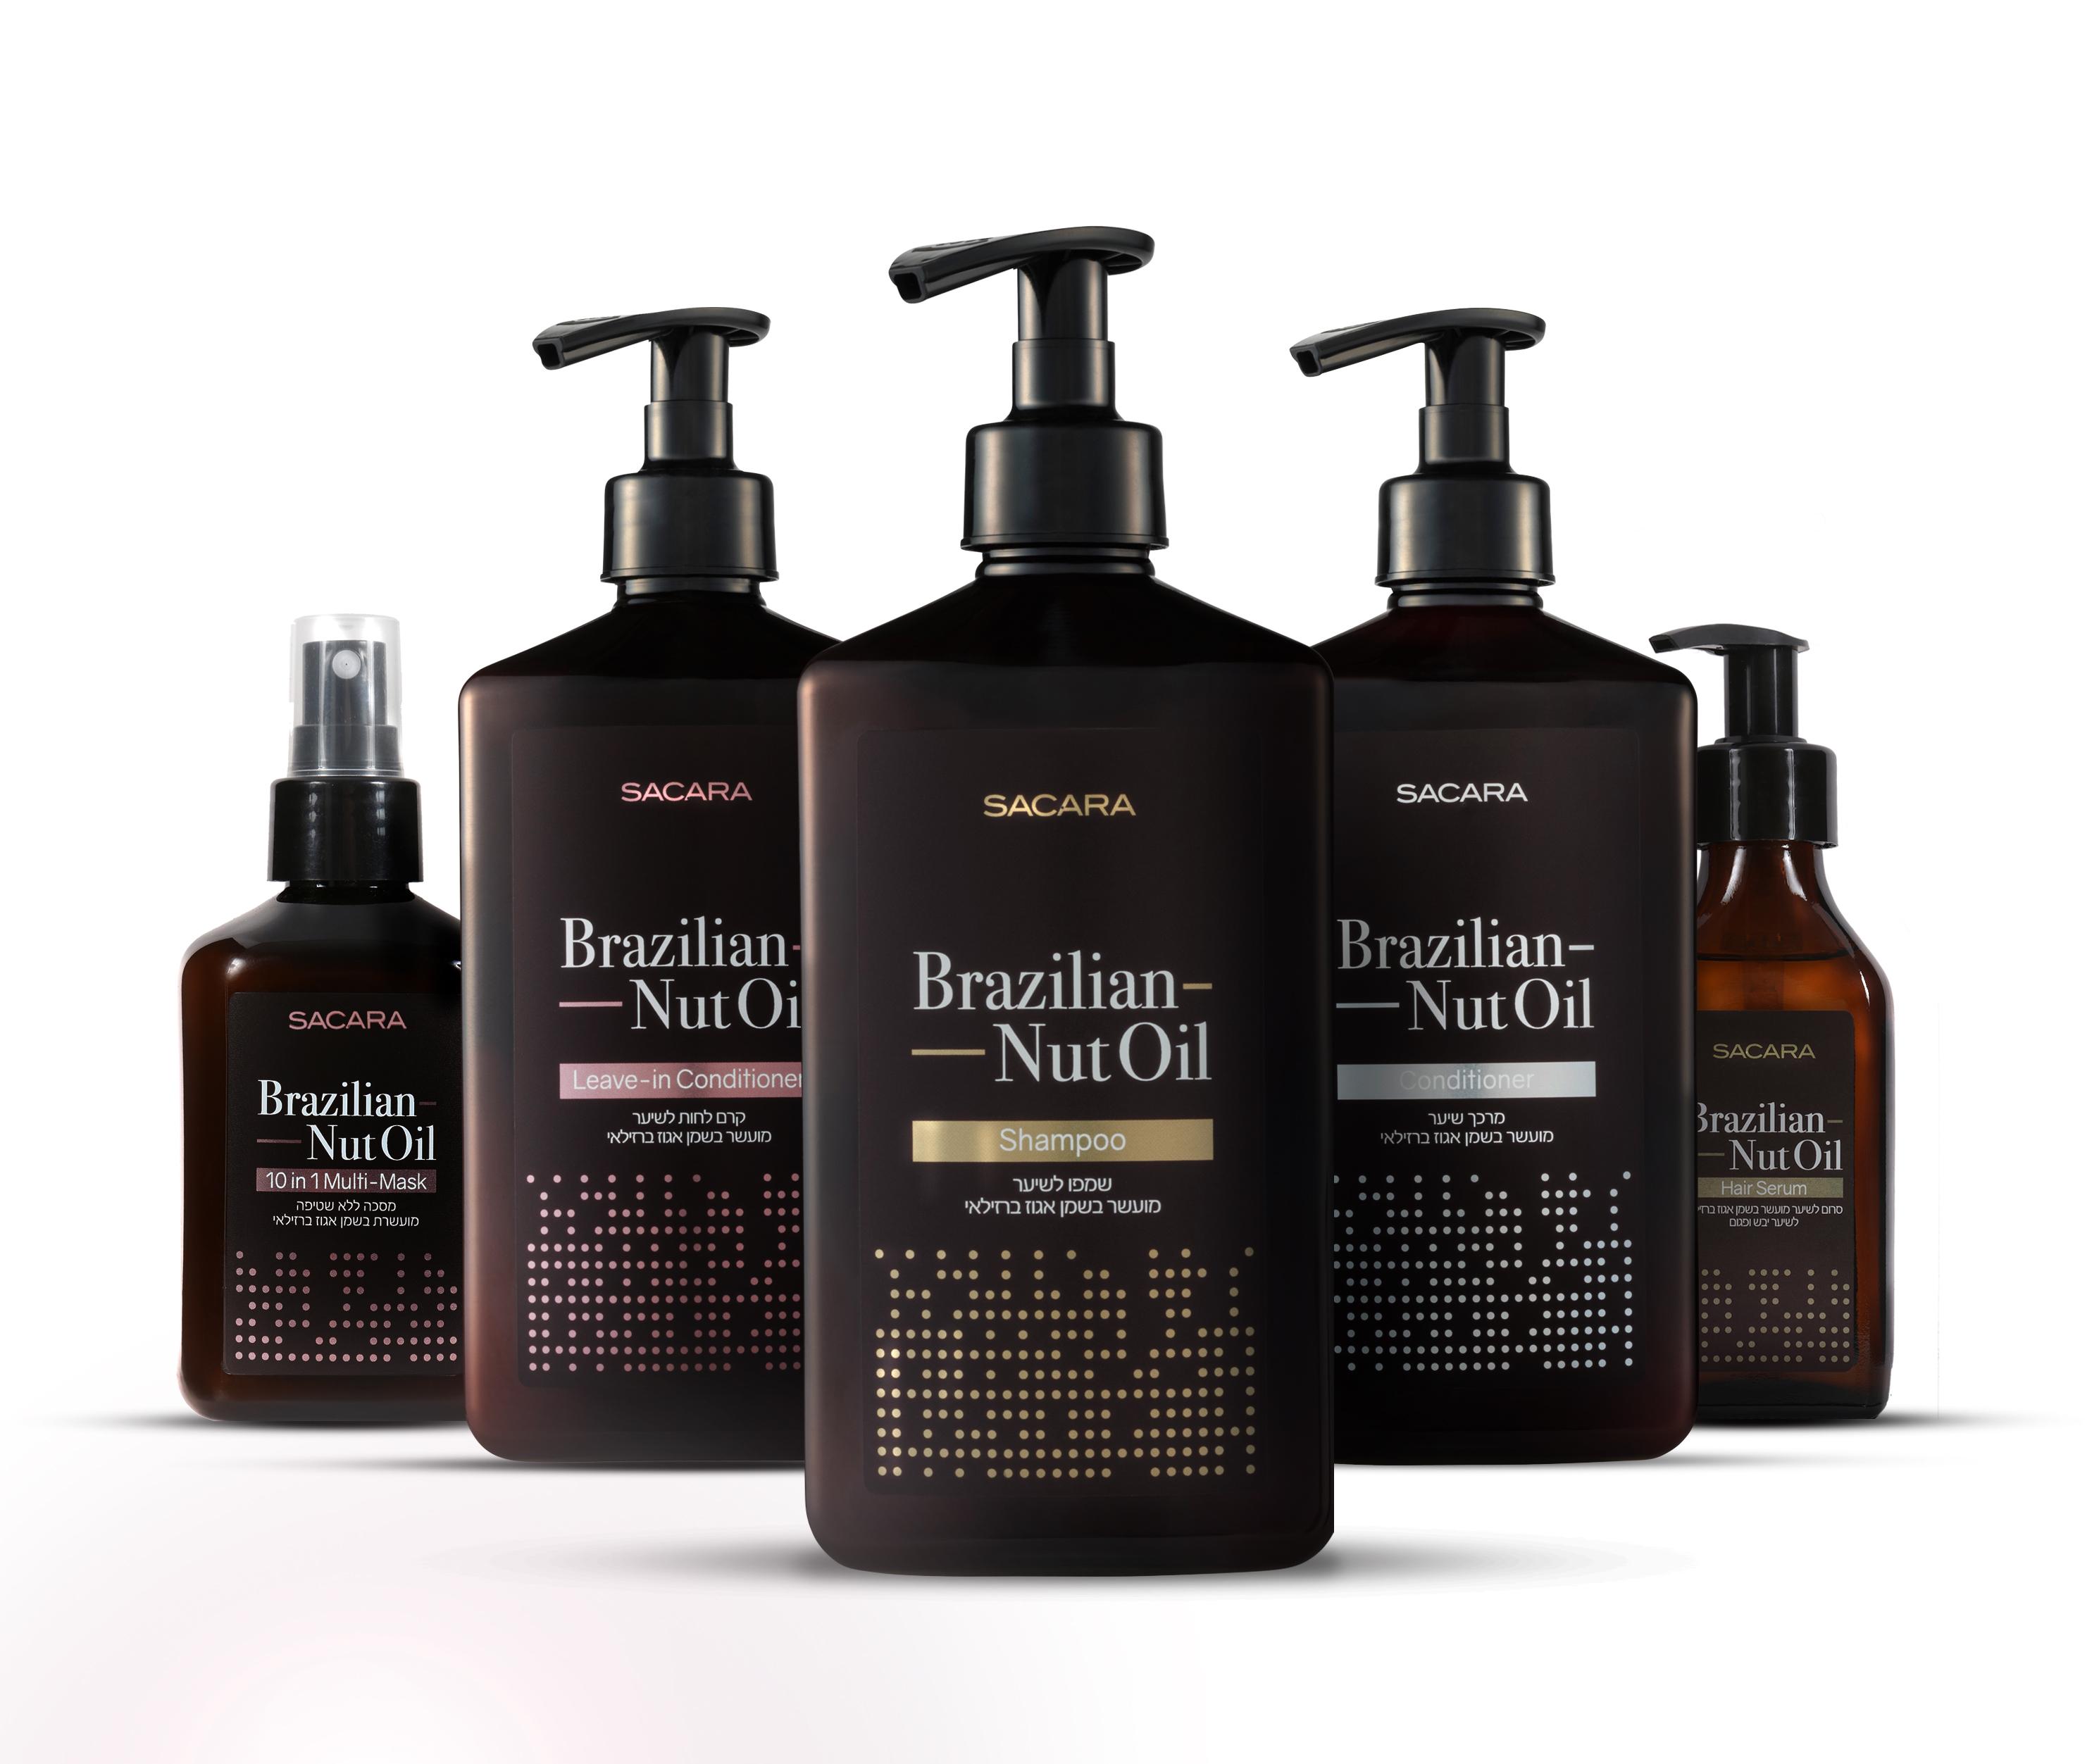 Brazilion Nut Oil by SACARA Cosmetics